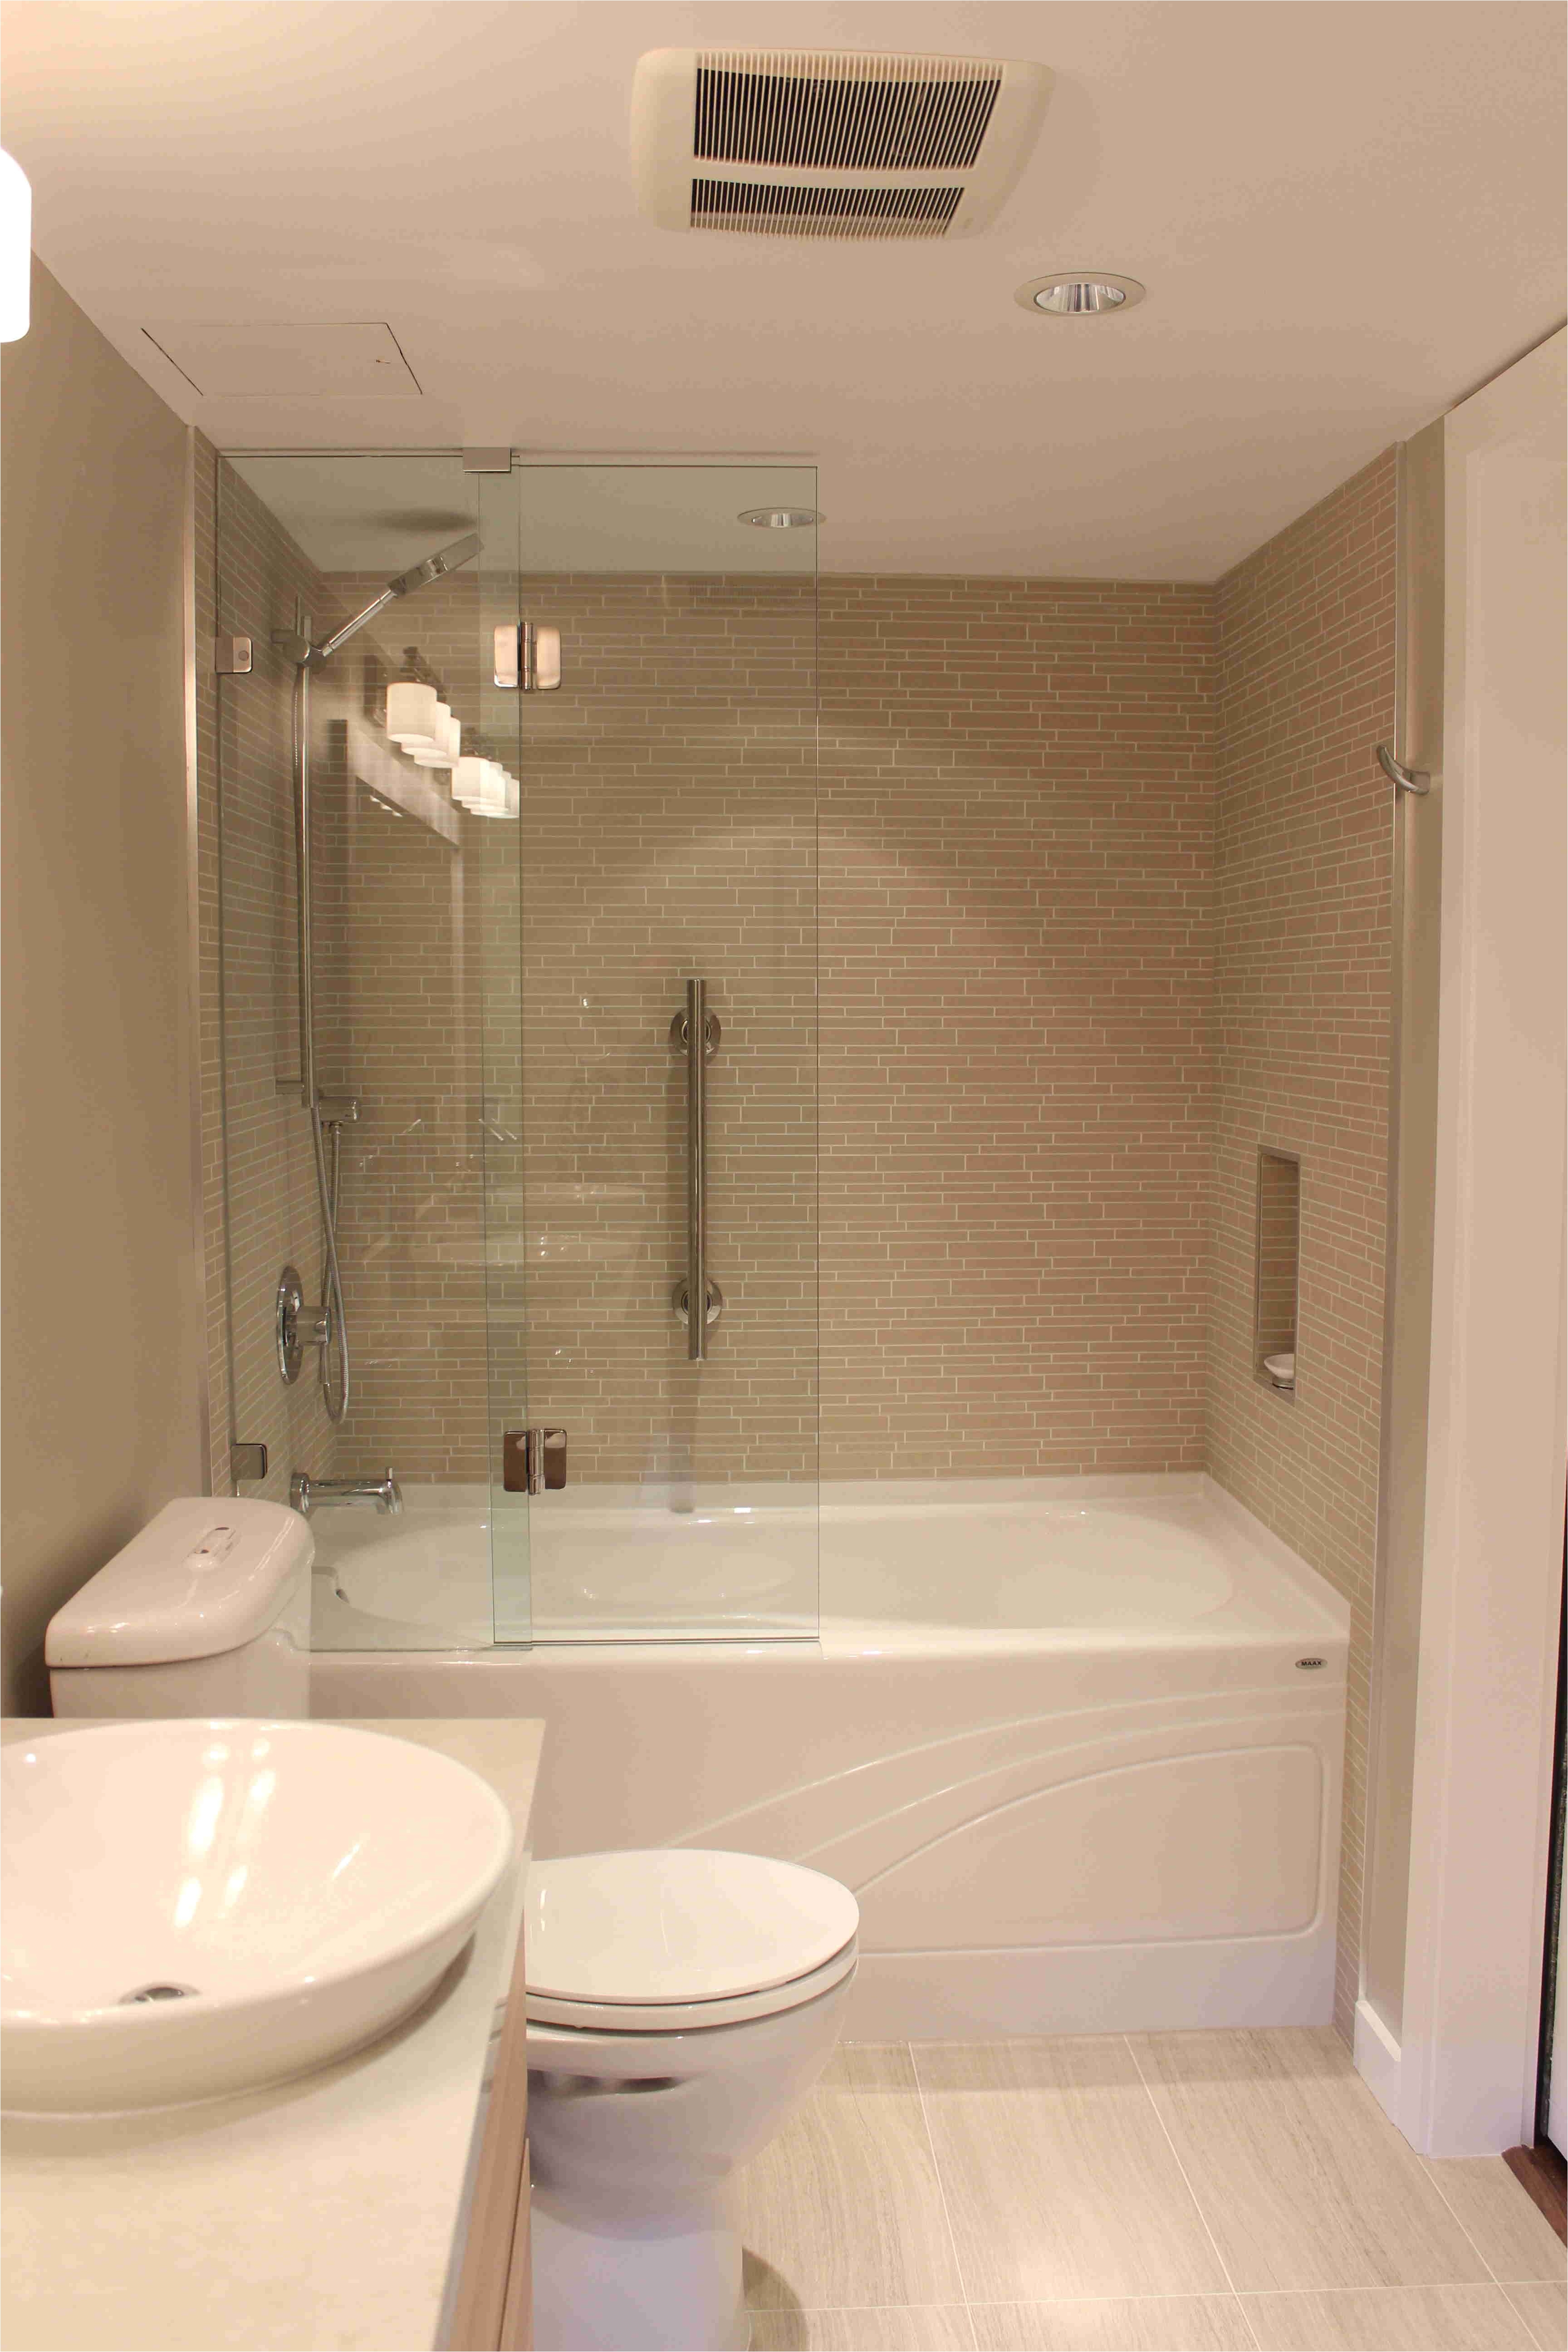 master bathroom remodel ideas 2017 screet master bathroom remodel ideas 2017 master bathroom with glass installed for walk in shower no